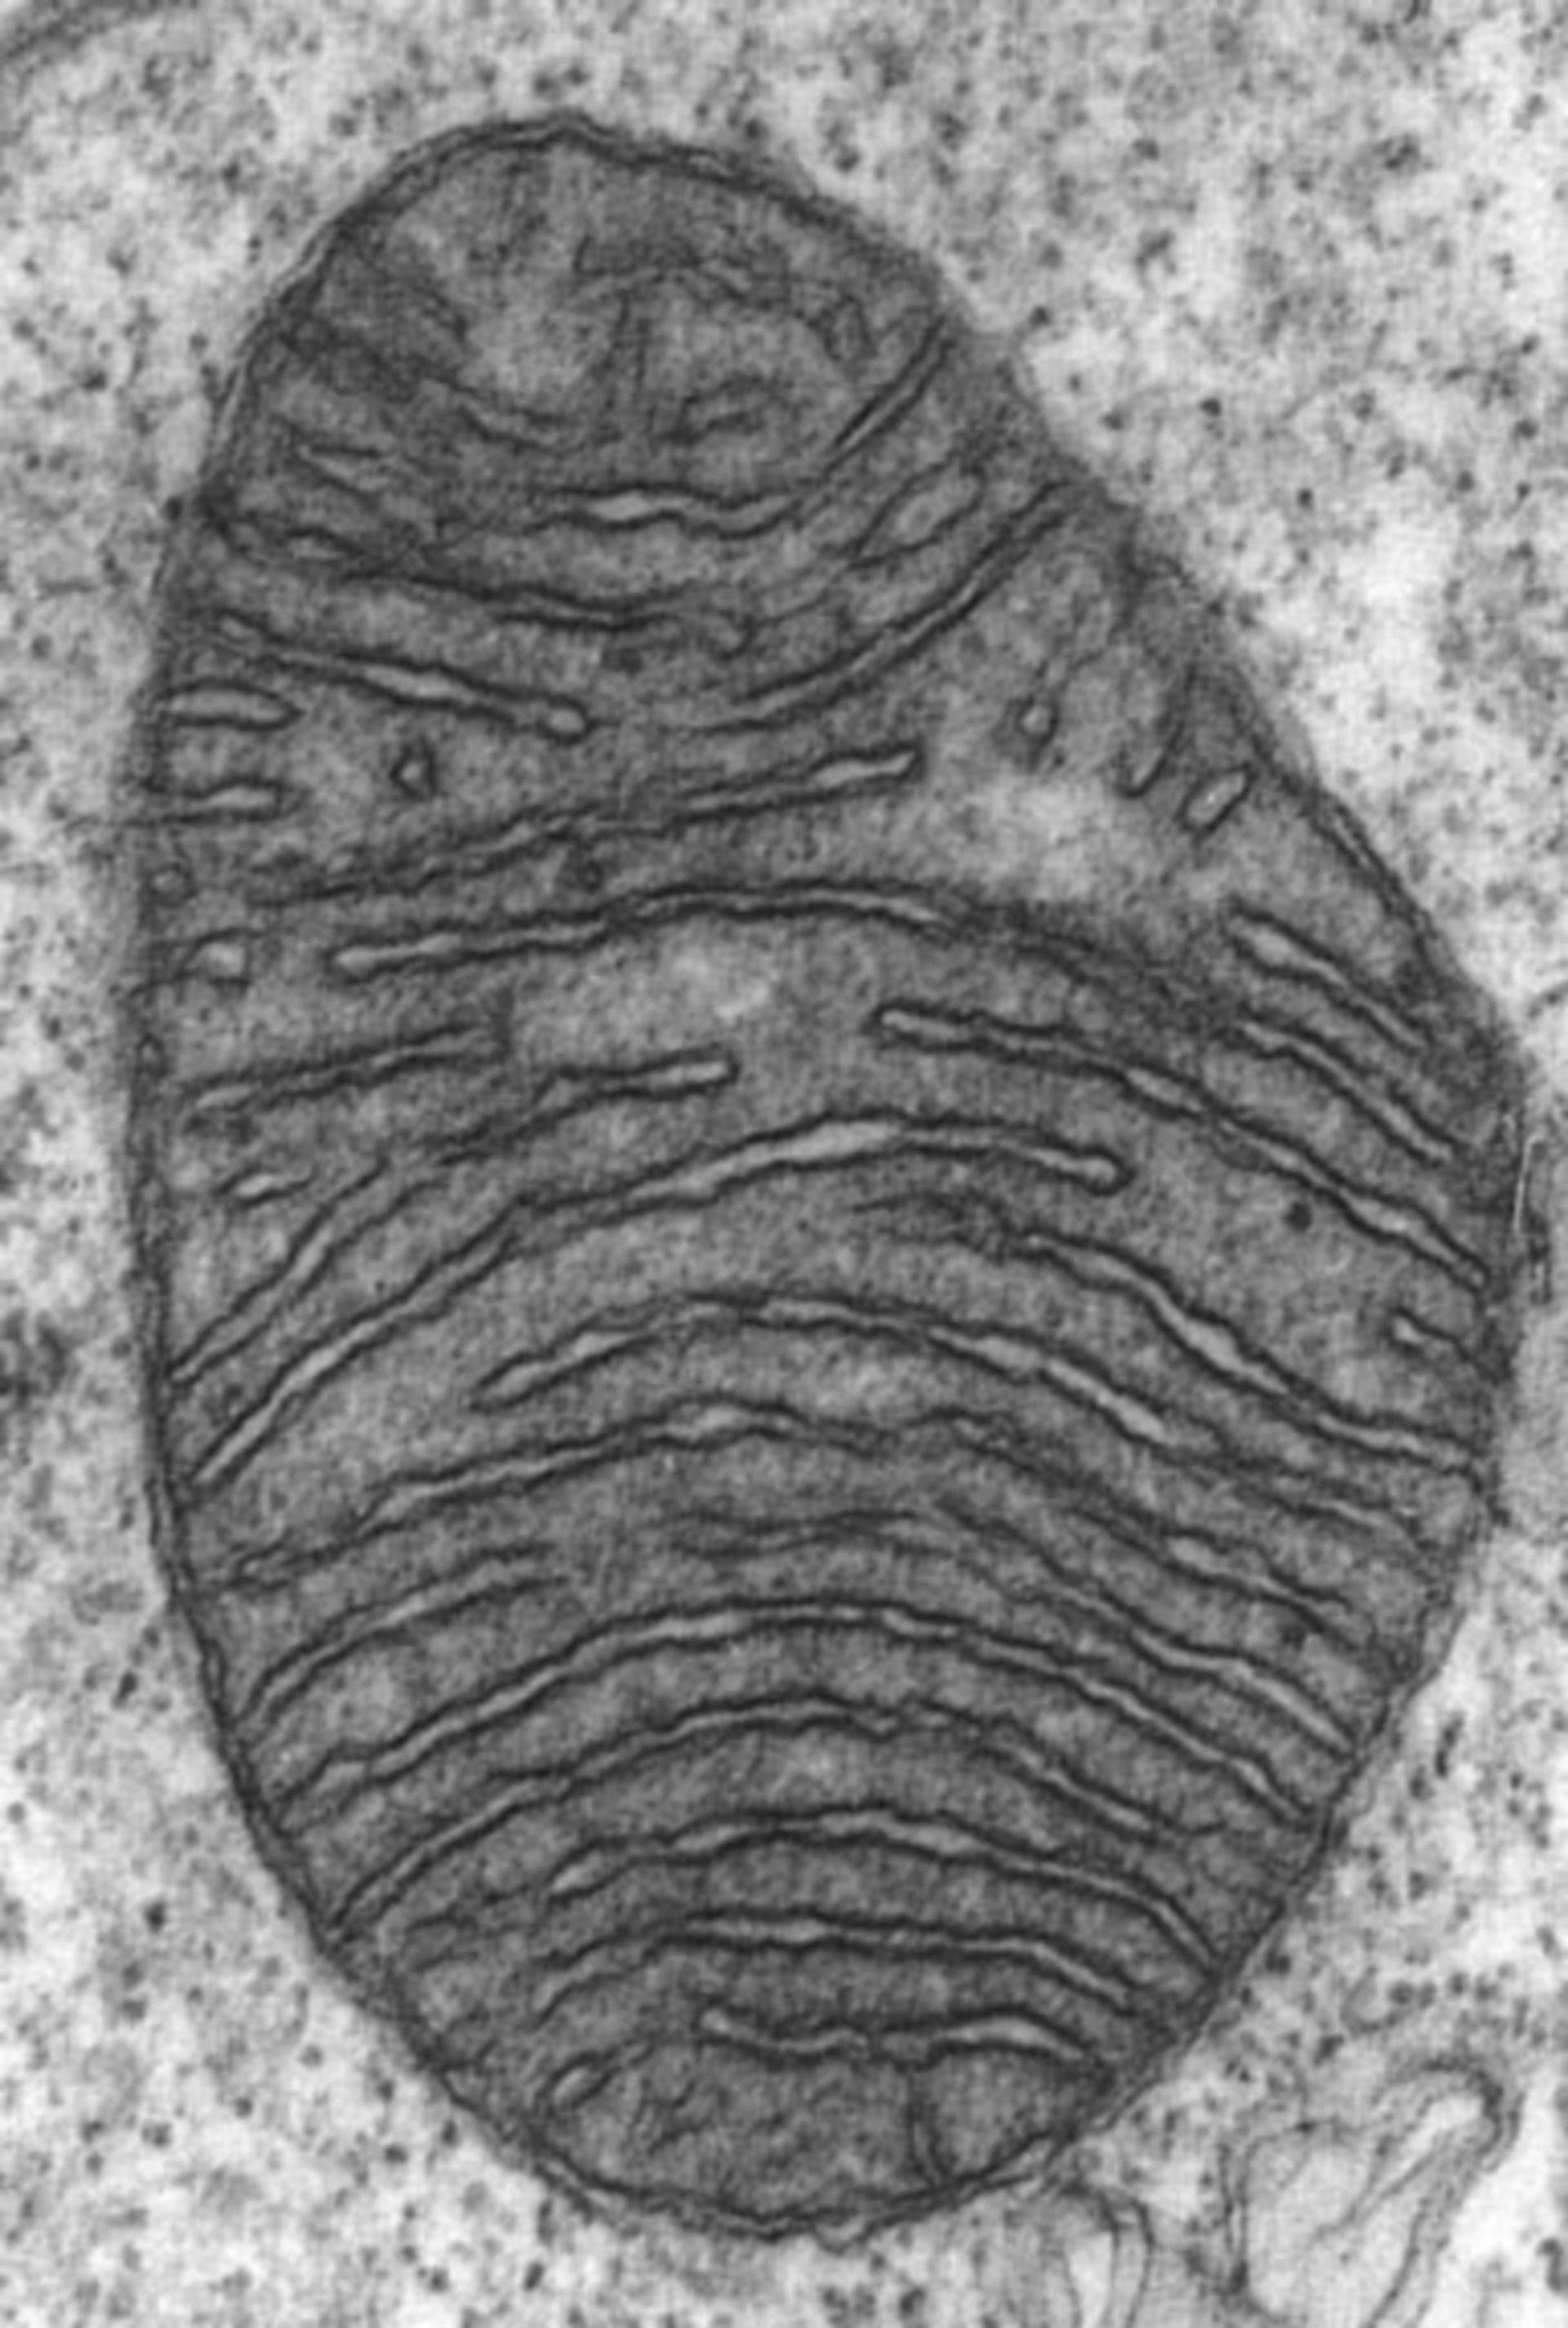 Ultrastruktur Mitochondrium